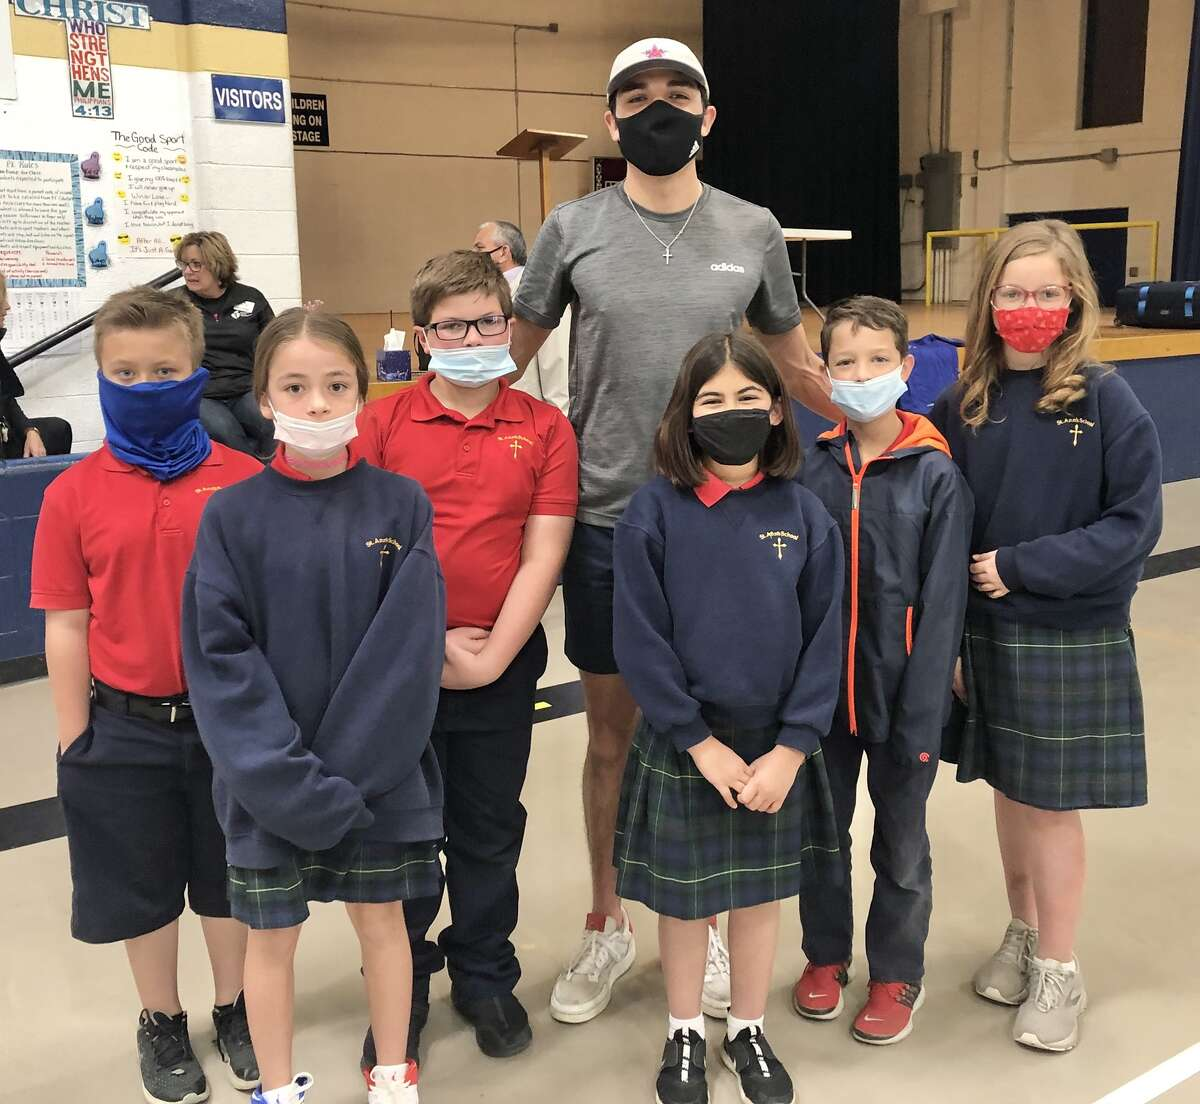 St. Ann's School alum Bryce Hoppel spoke recently at a school assembly at St. Ann's Catholic School.